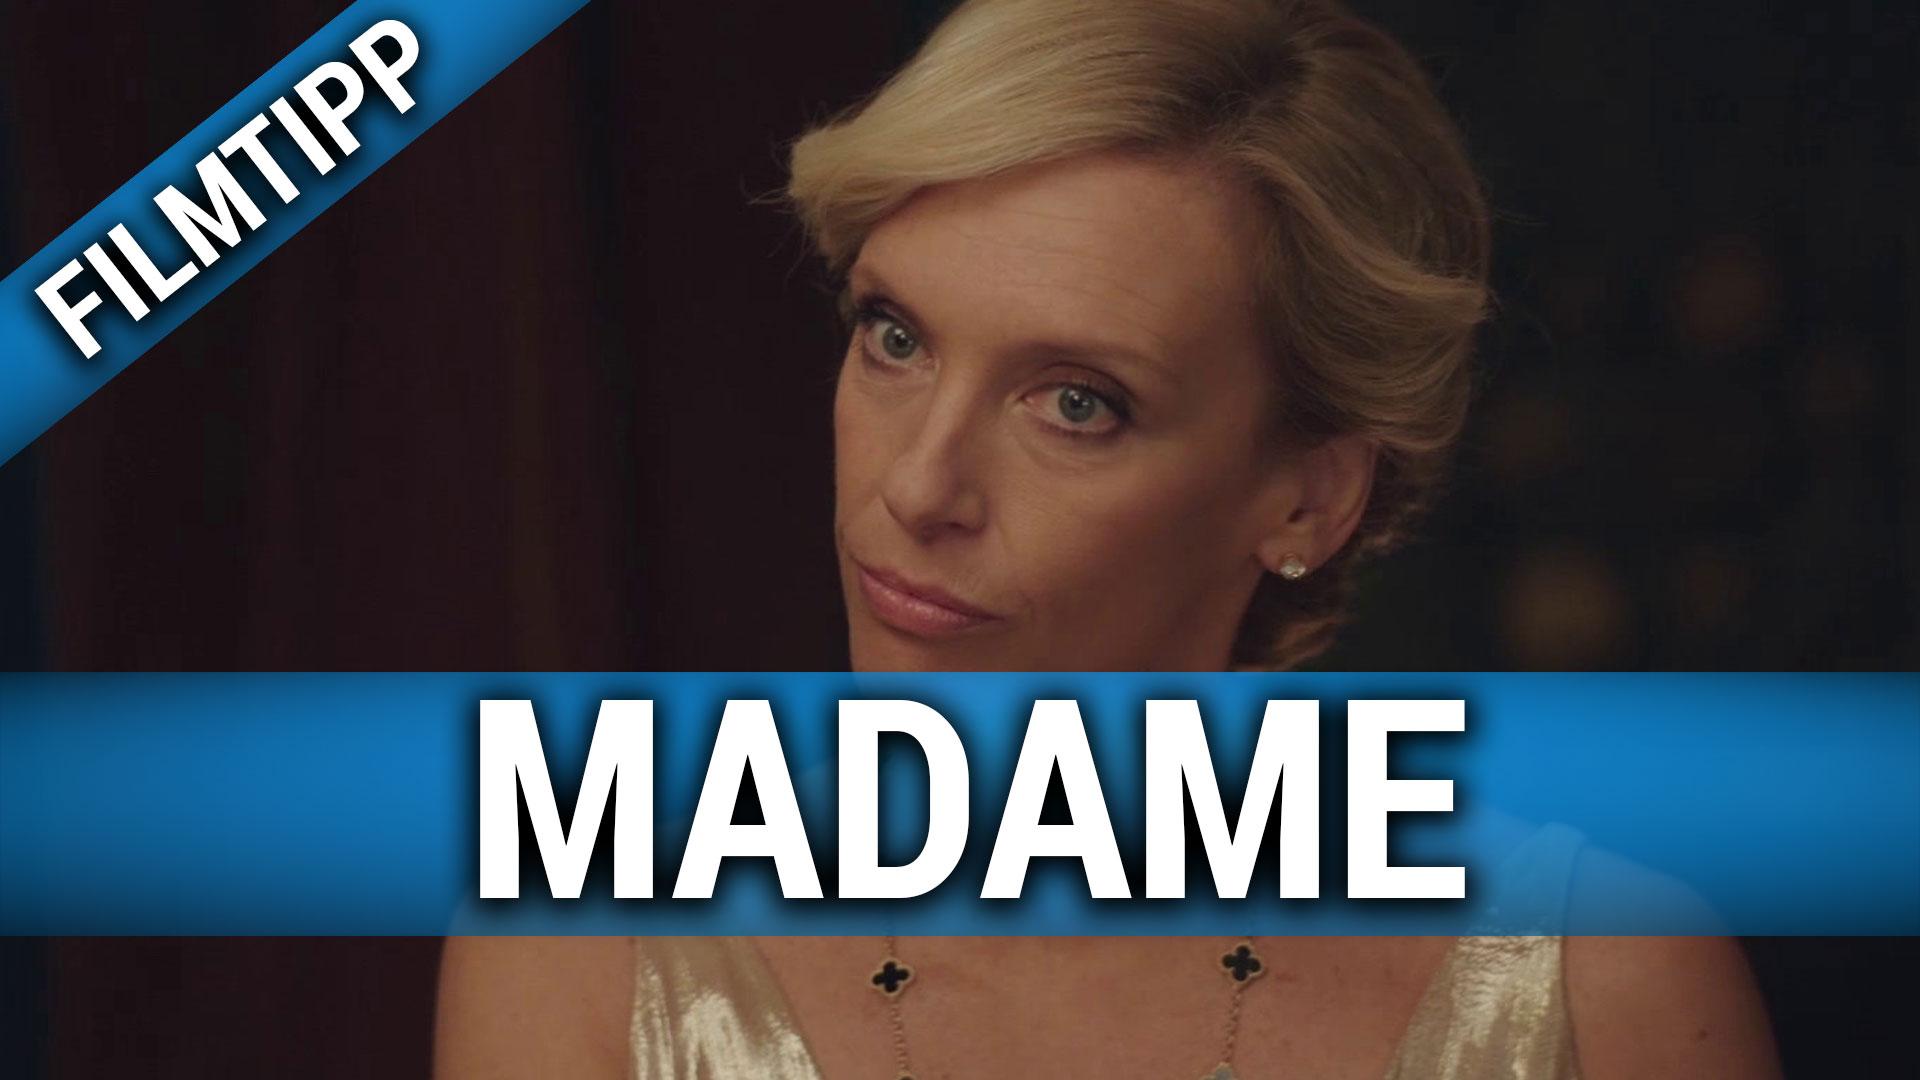 Madame Trailer